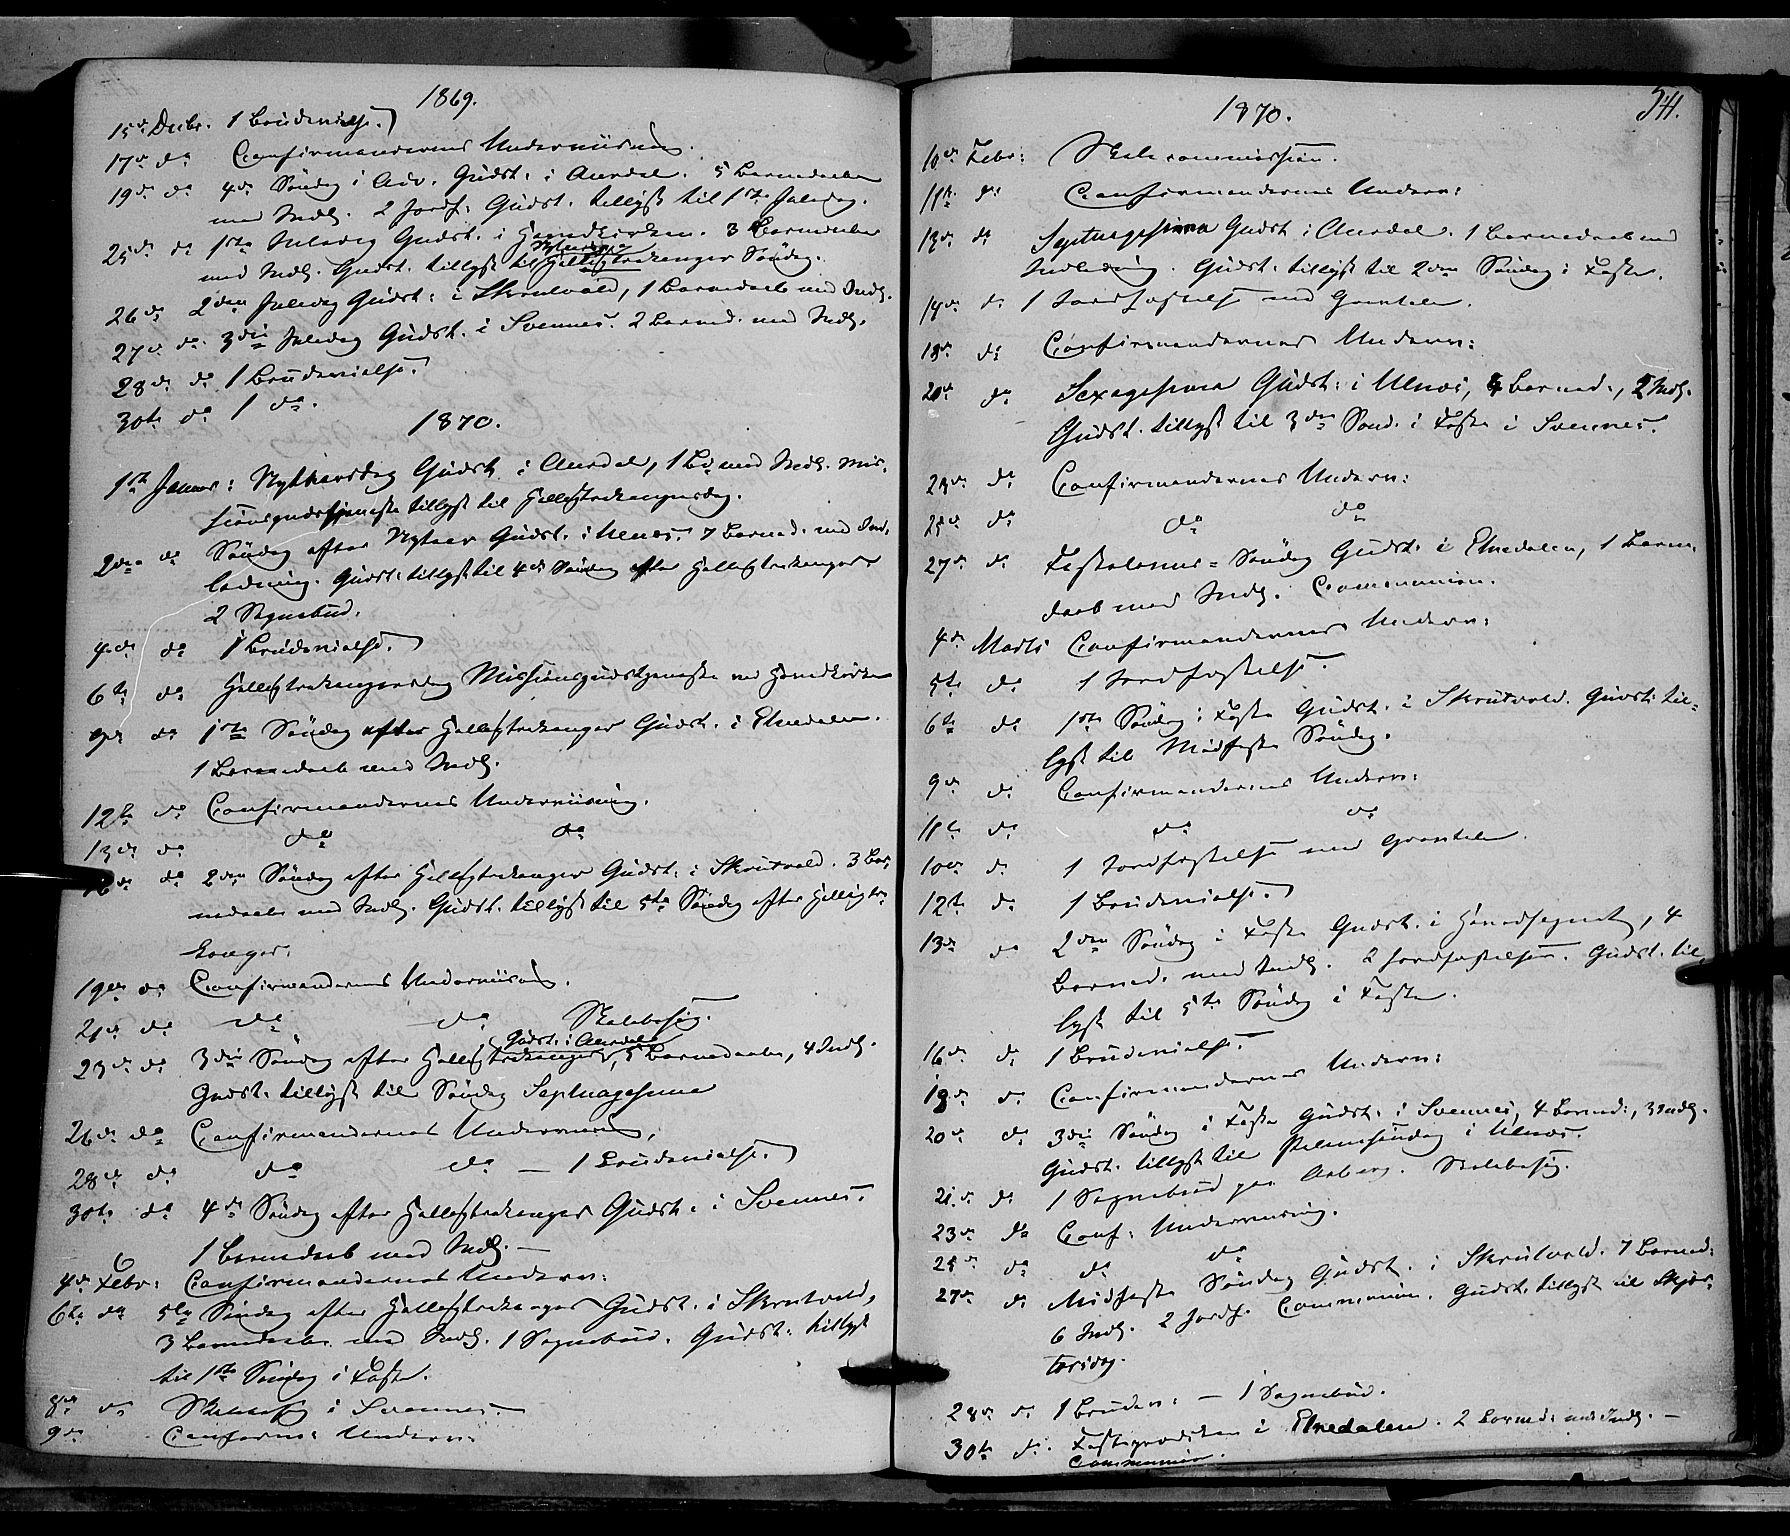 SAH, Nord-Aurdal prestekontor, Ministerialbok nr. 8, 1863-1875, s. 541